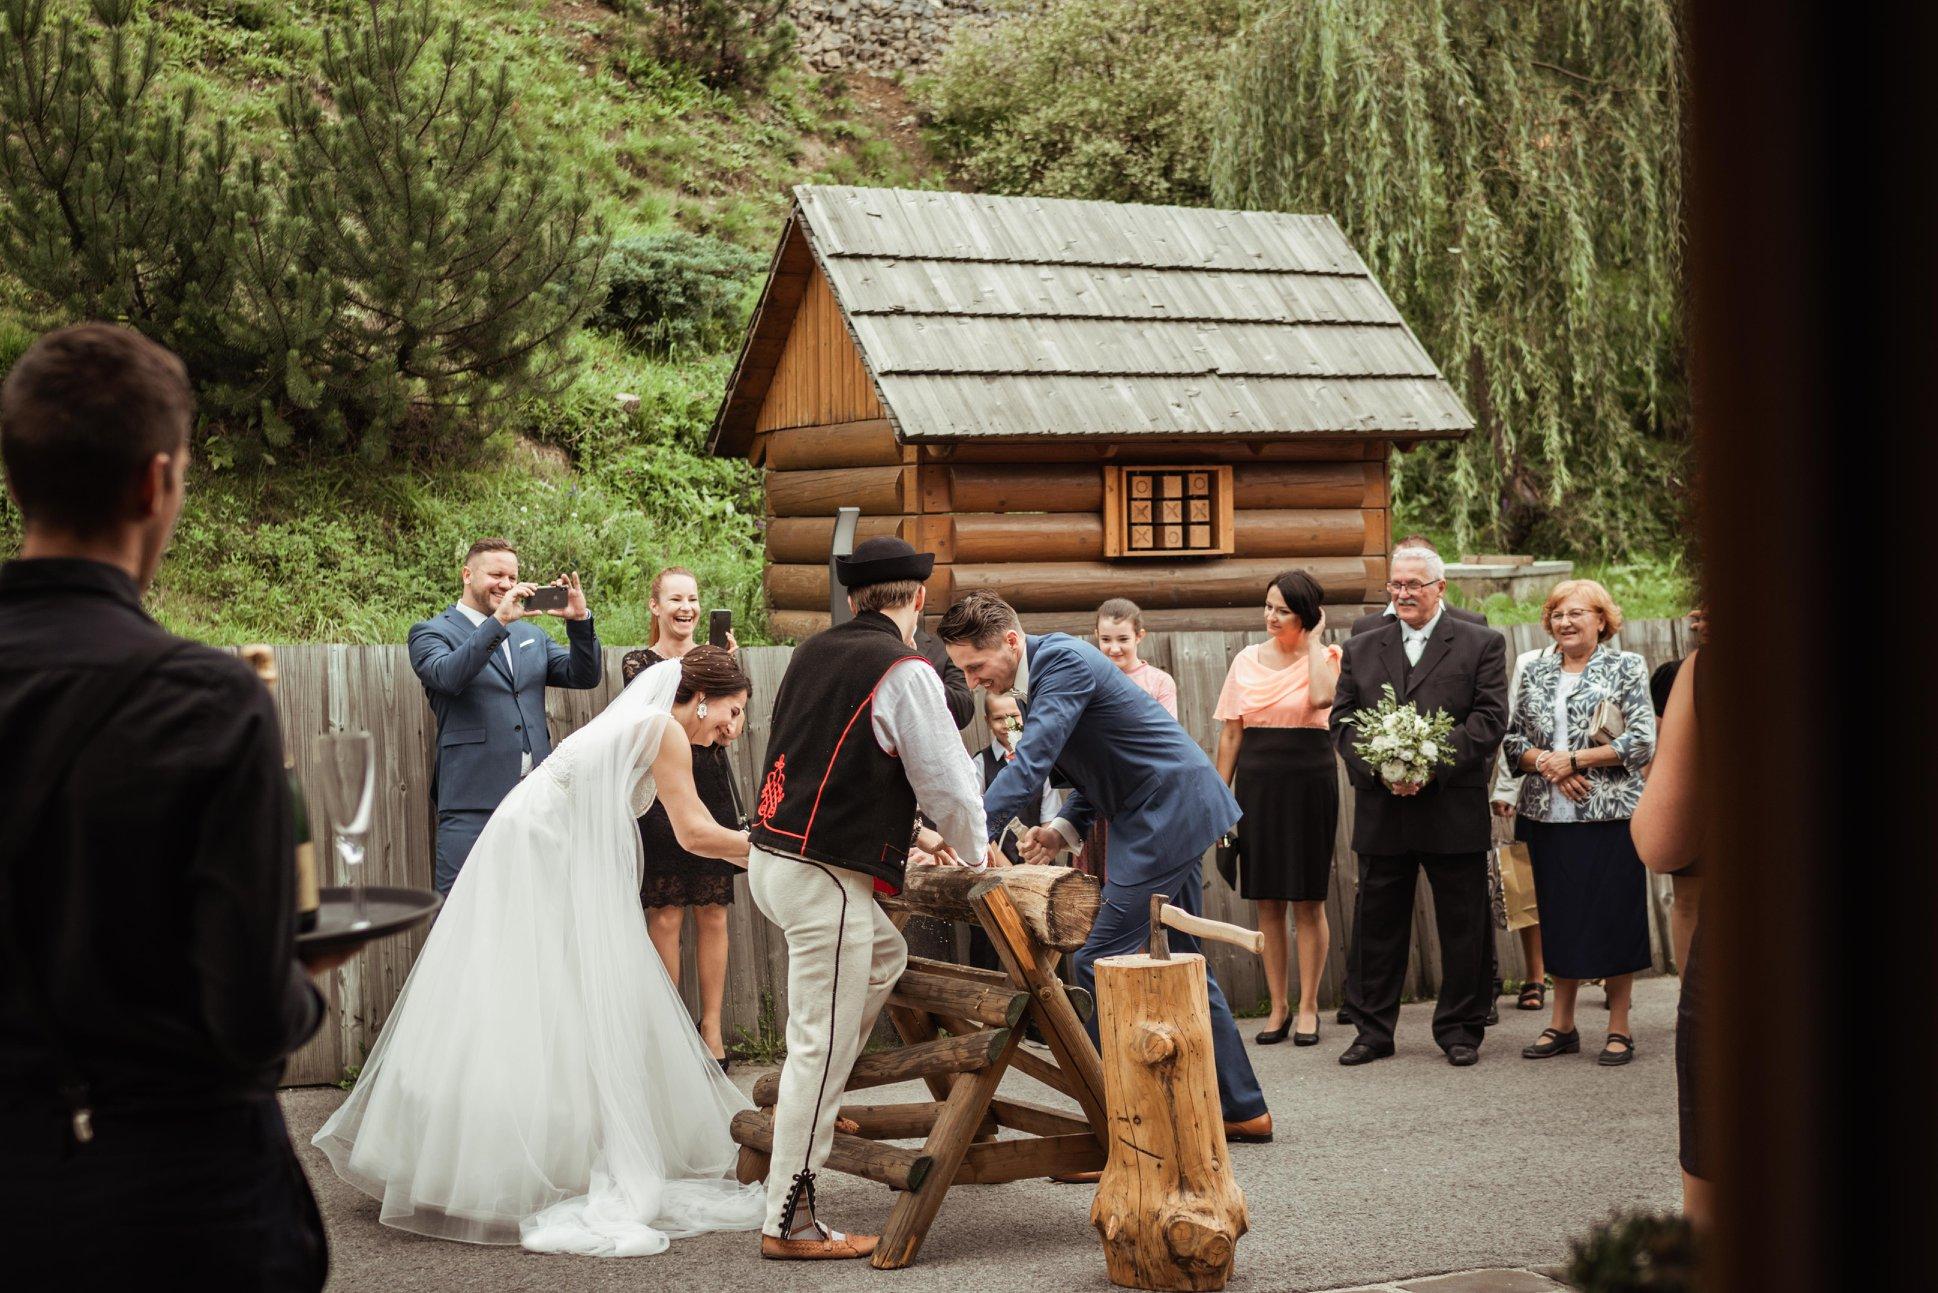 svadobne-tradiciejpg